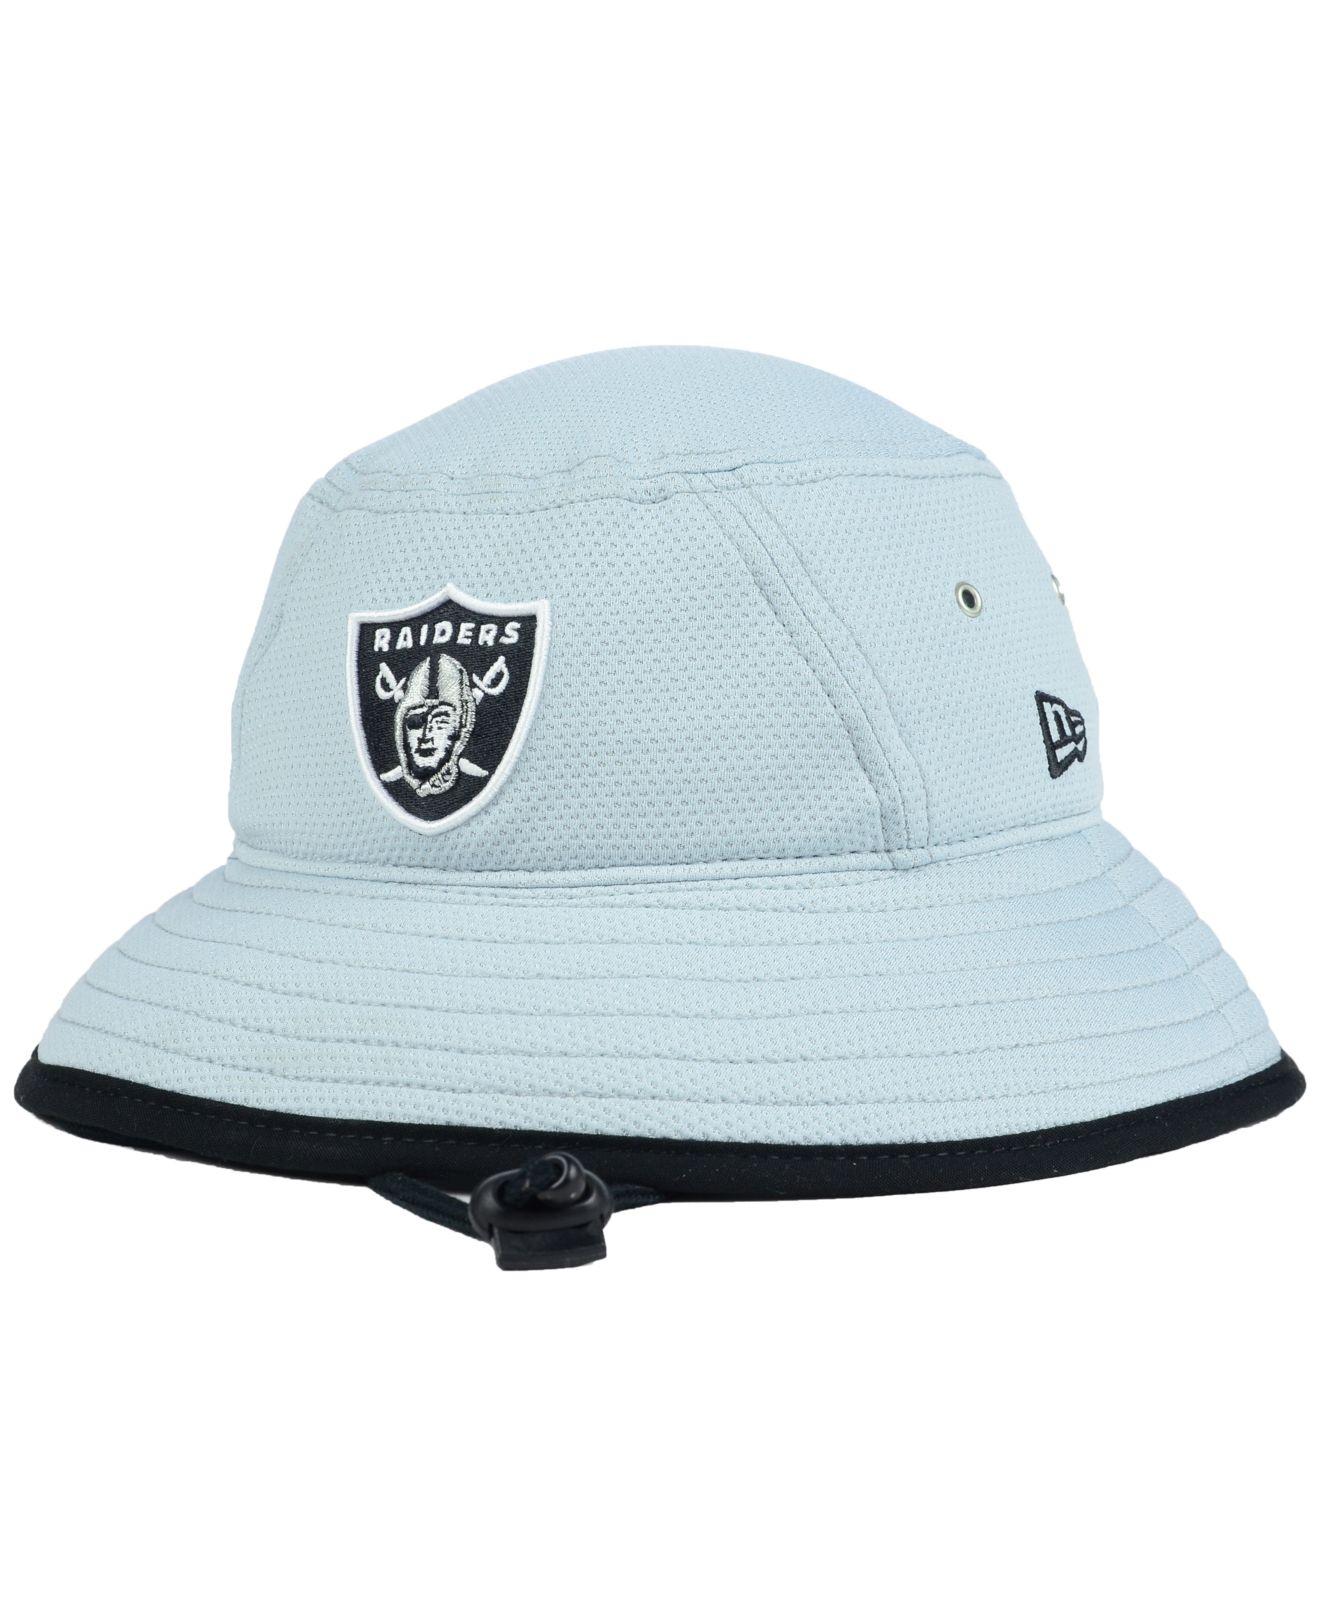 4607ac7cc71 Lyst - KTZ Oakland Raiders Training Bucket Hat in Gray for Men